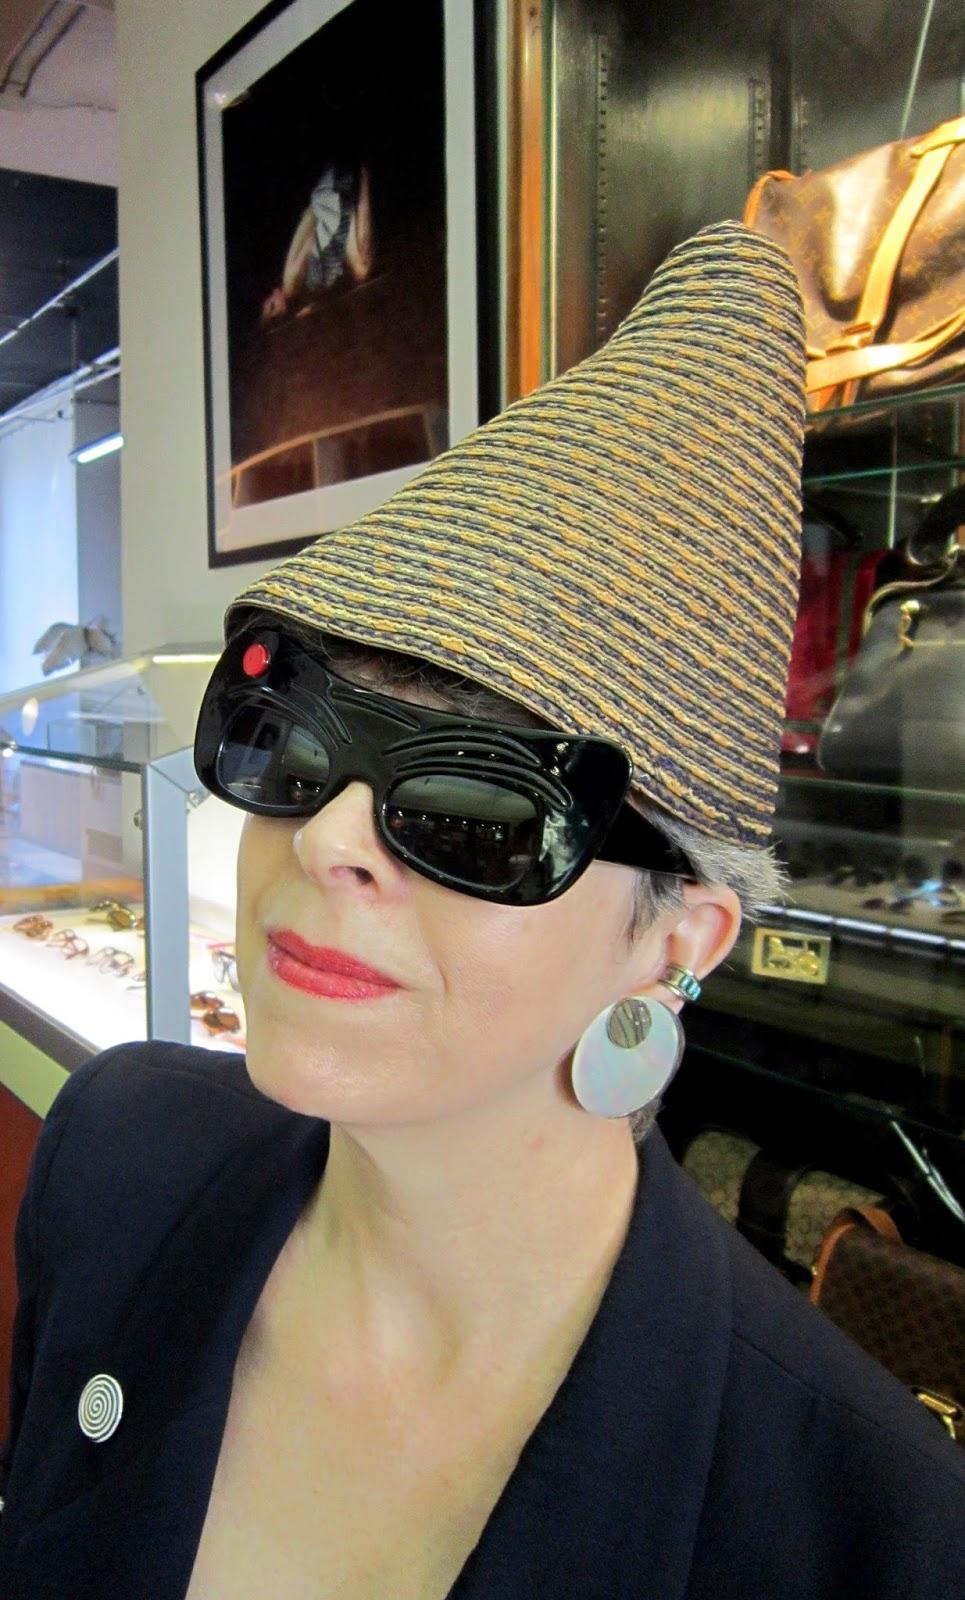 Idiosyncratic Fashionistas Goo Goo Eyes